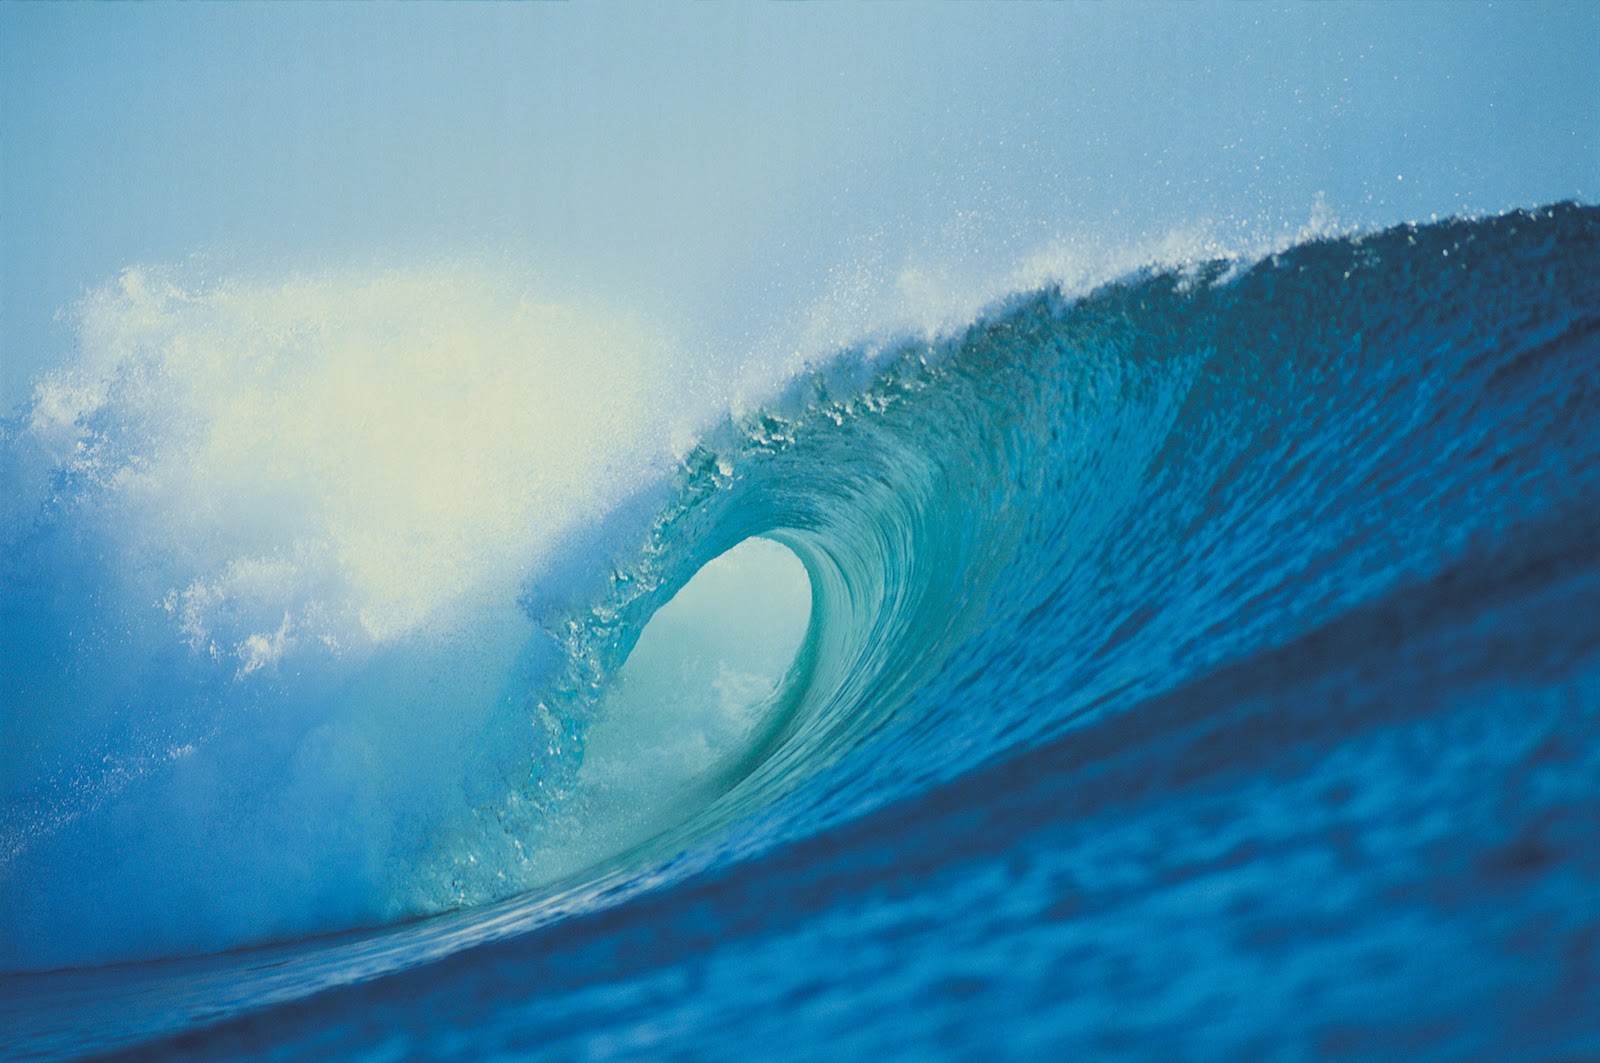 Photo Wallpaper Powerful Ocean Waves My image 1600x1063